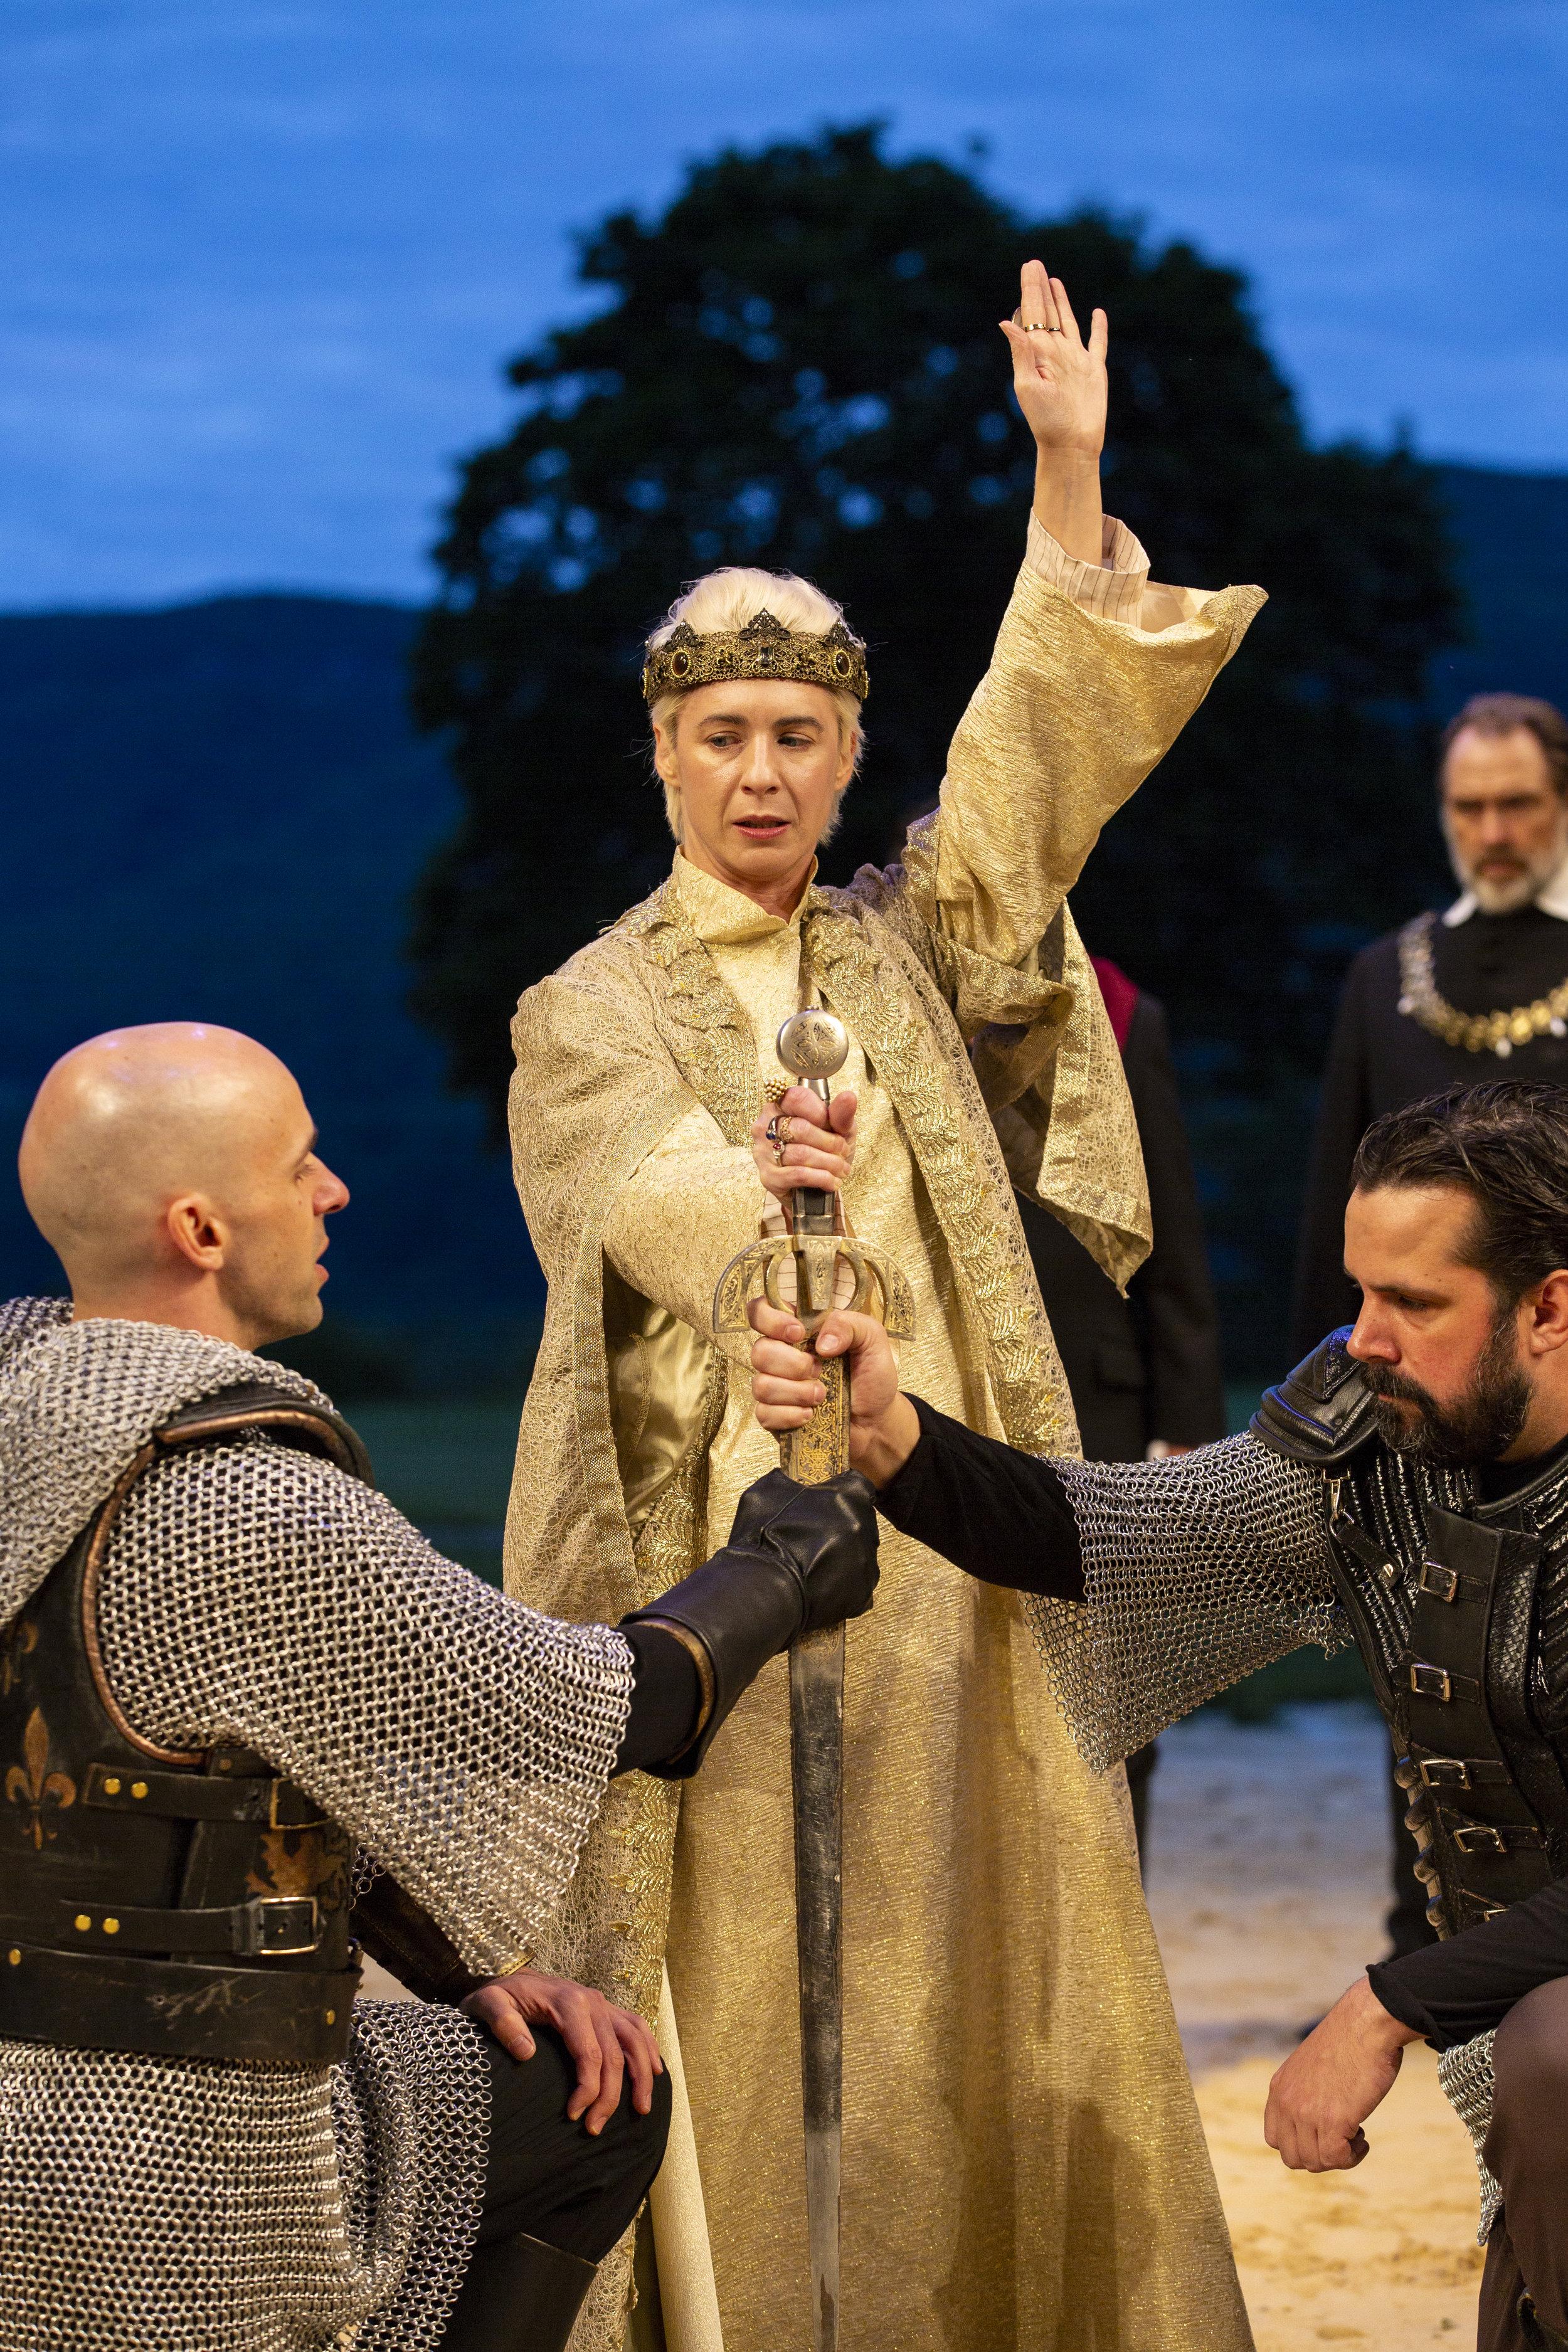 Richard II   By William Shakespeare  Directed by Davis McCallum  Hudson Valley Shakespeare Festival  2018